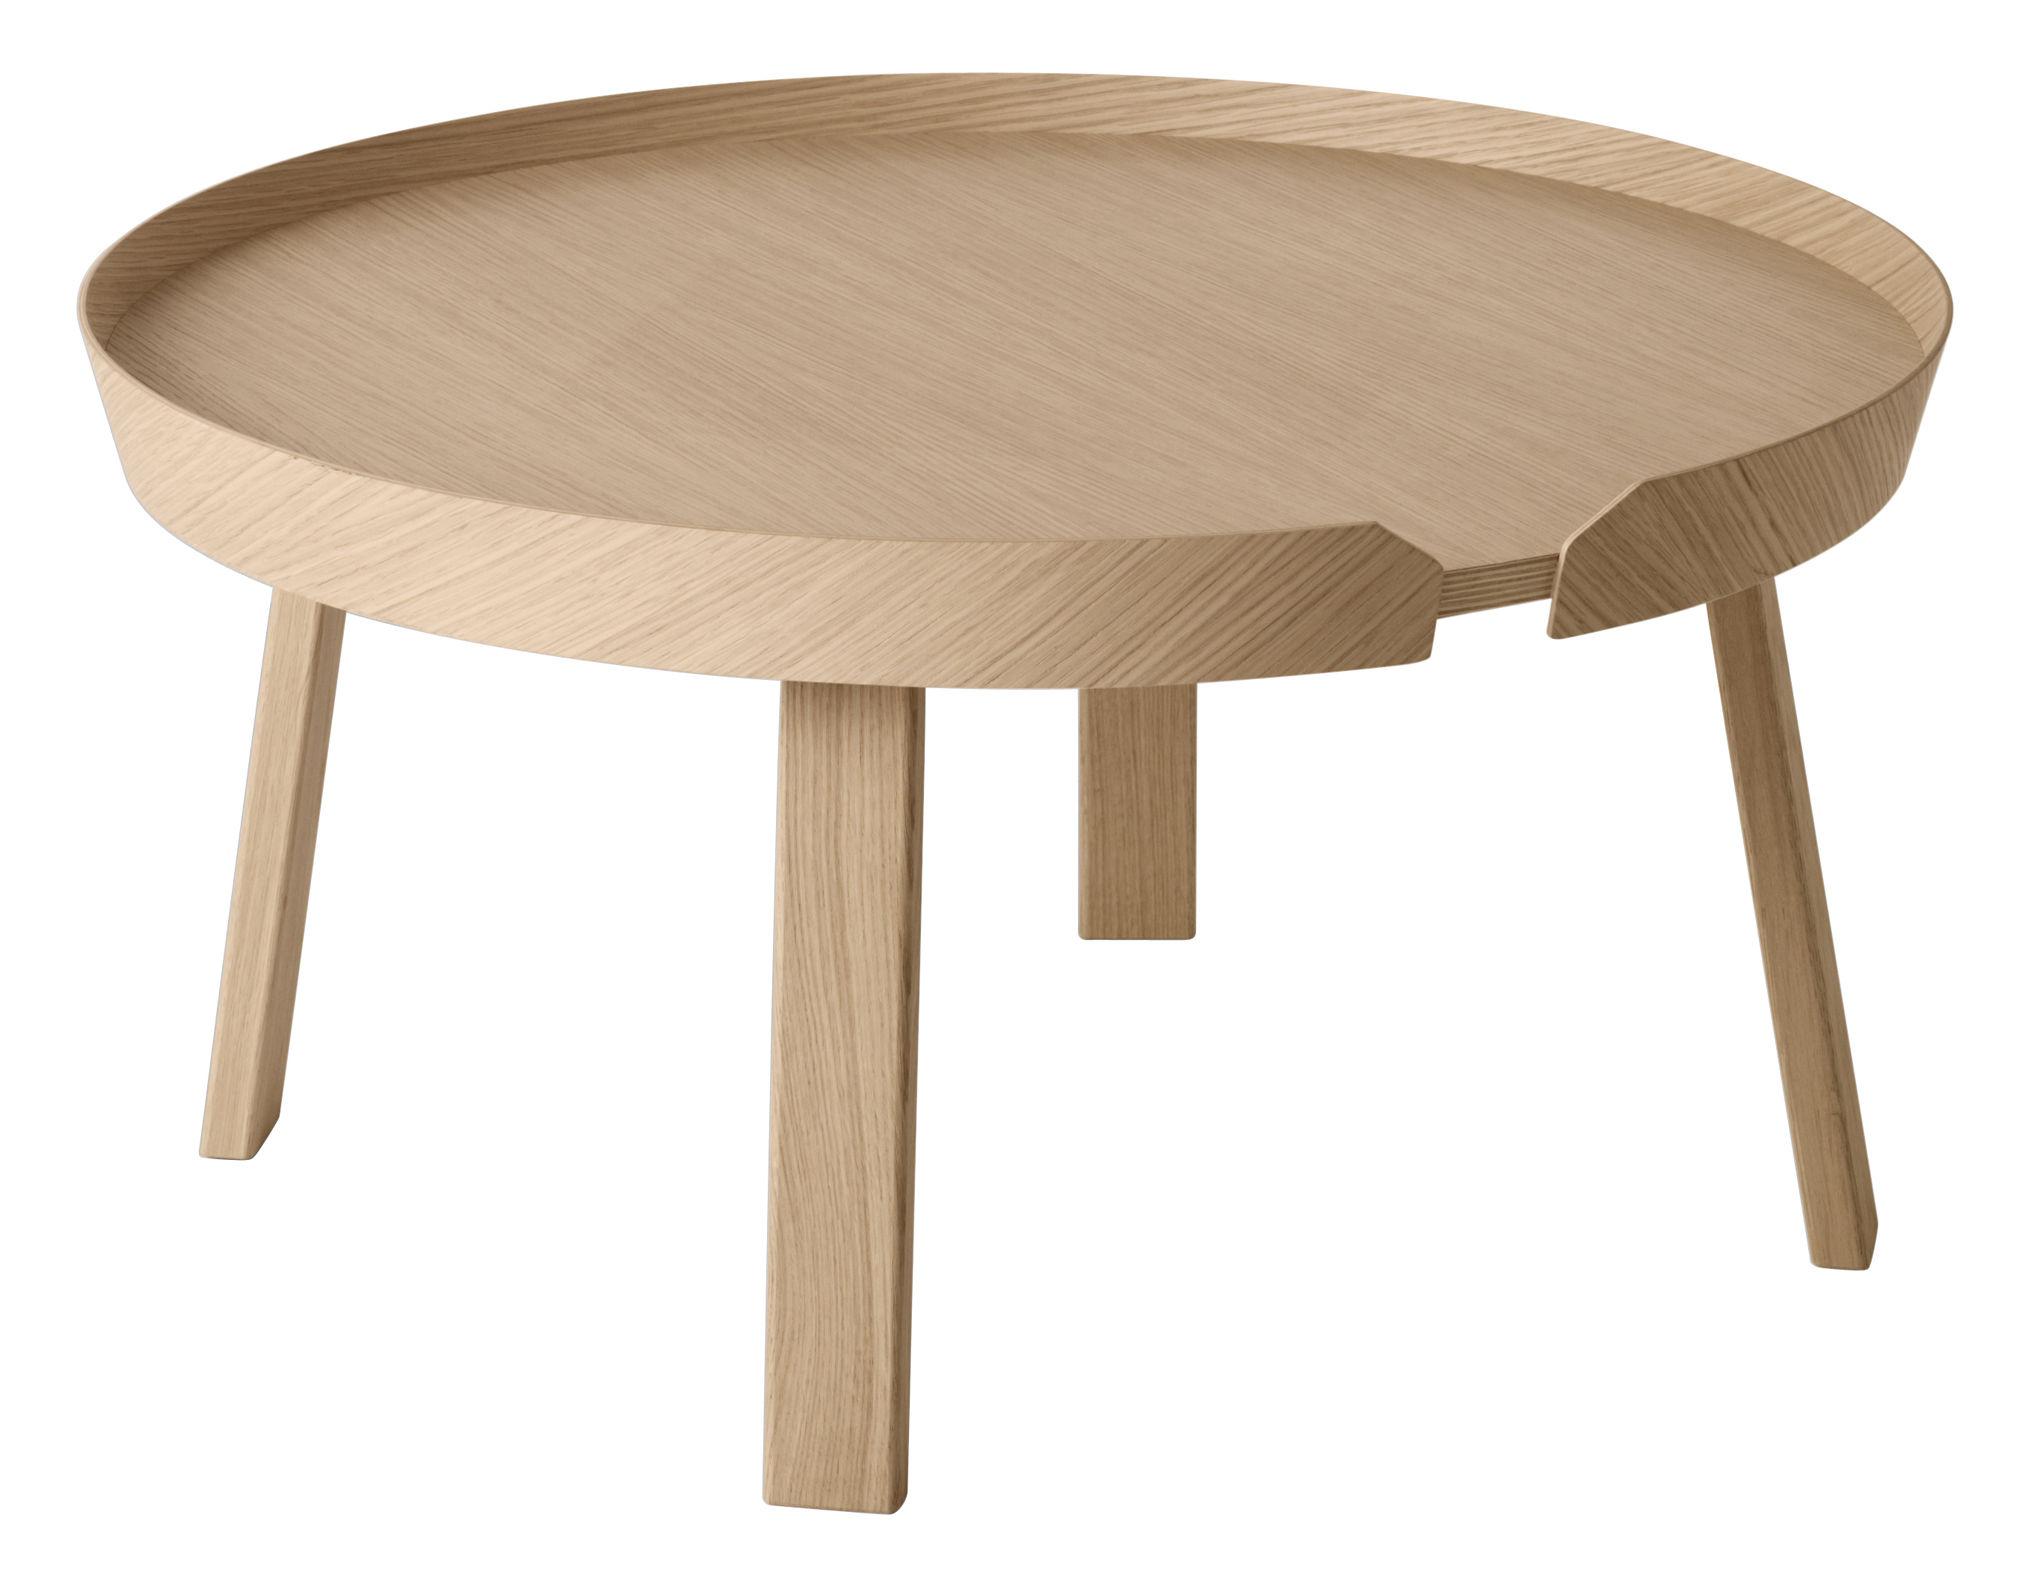 Mobilier - Tables basses - Table basse Around Large / Ø 72 x H 37,5 cm - Muuto - Chêne naturel - Chêne naturel